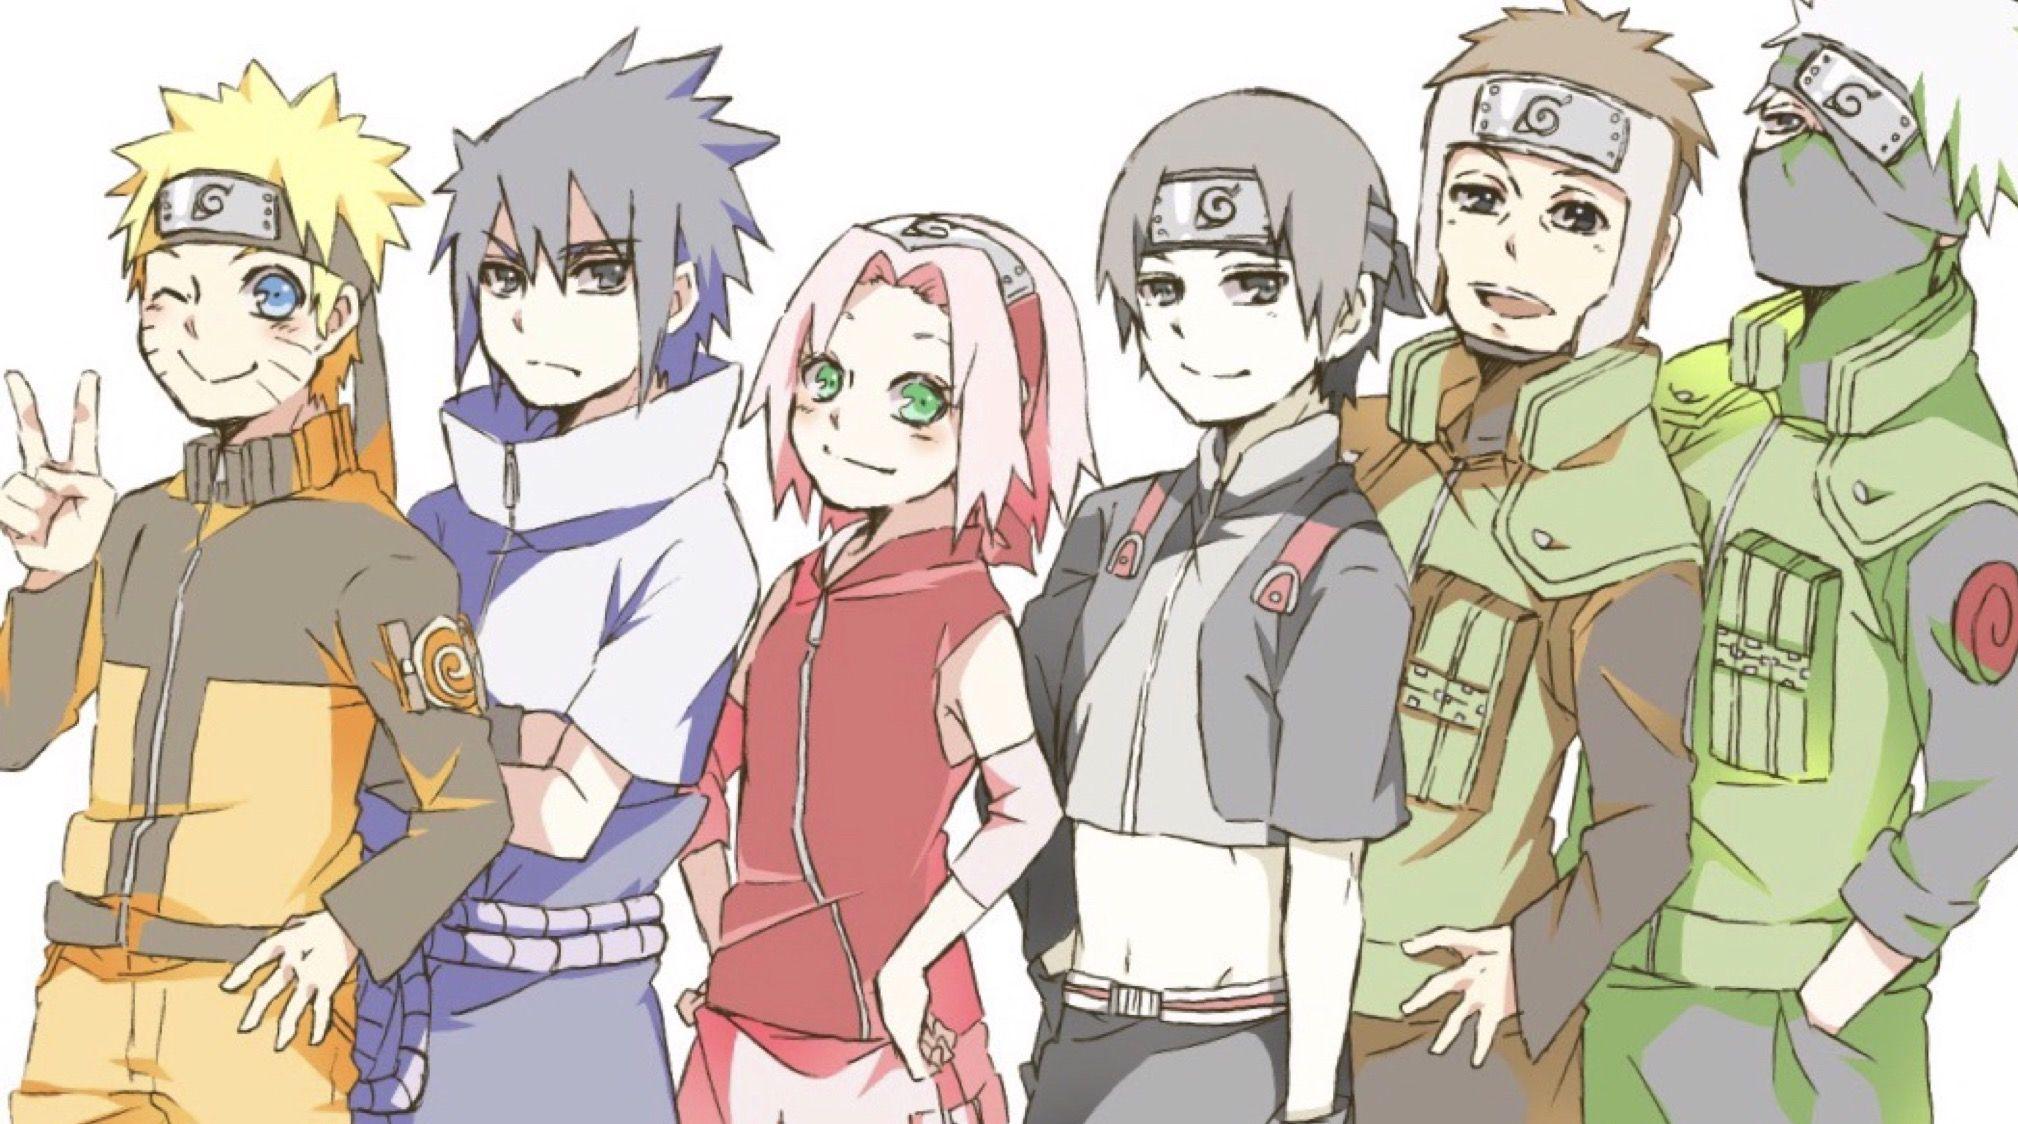 Anime naruto by Amaya Heinz on Naruto Naruto cute, Team 7